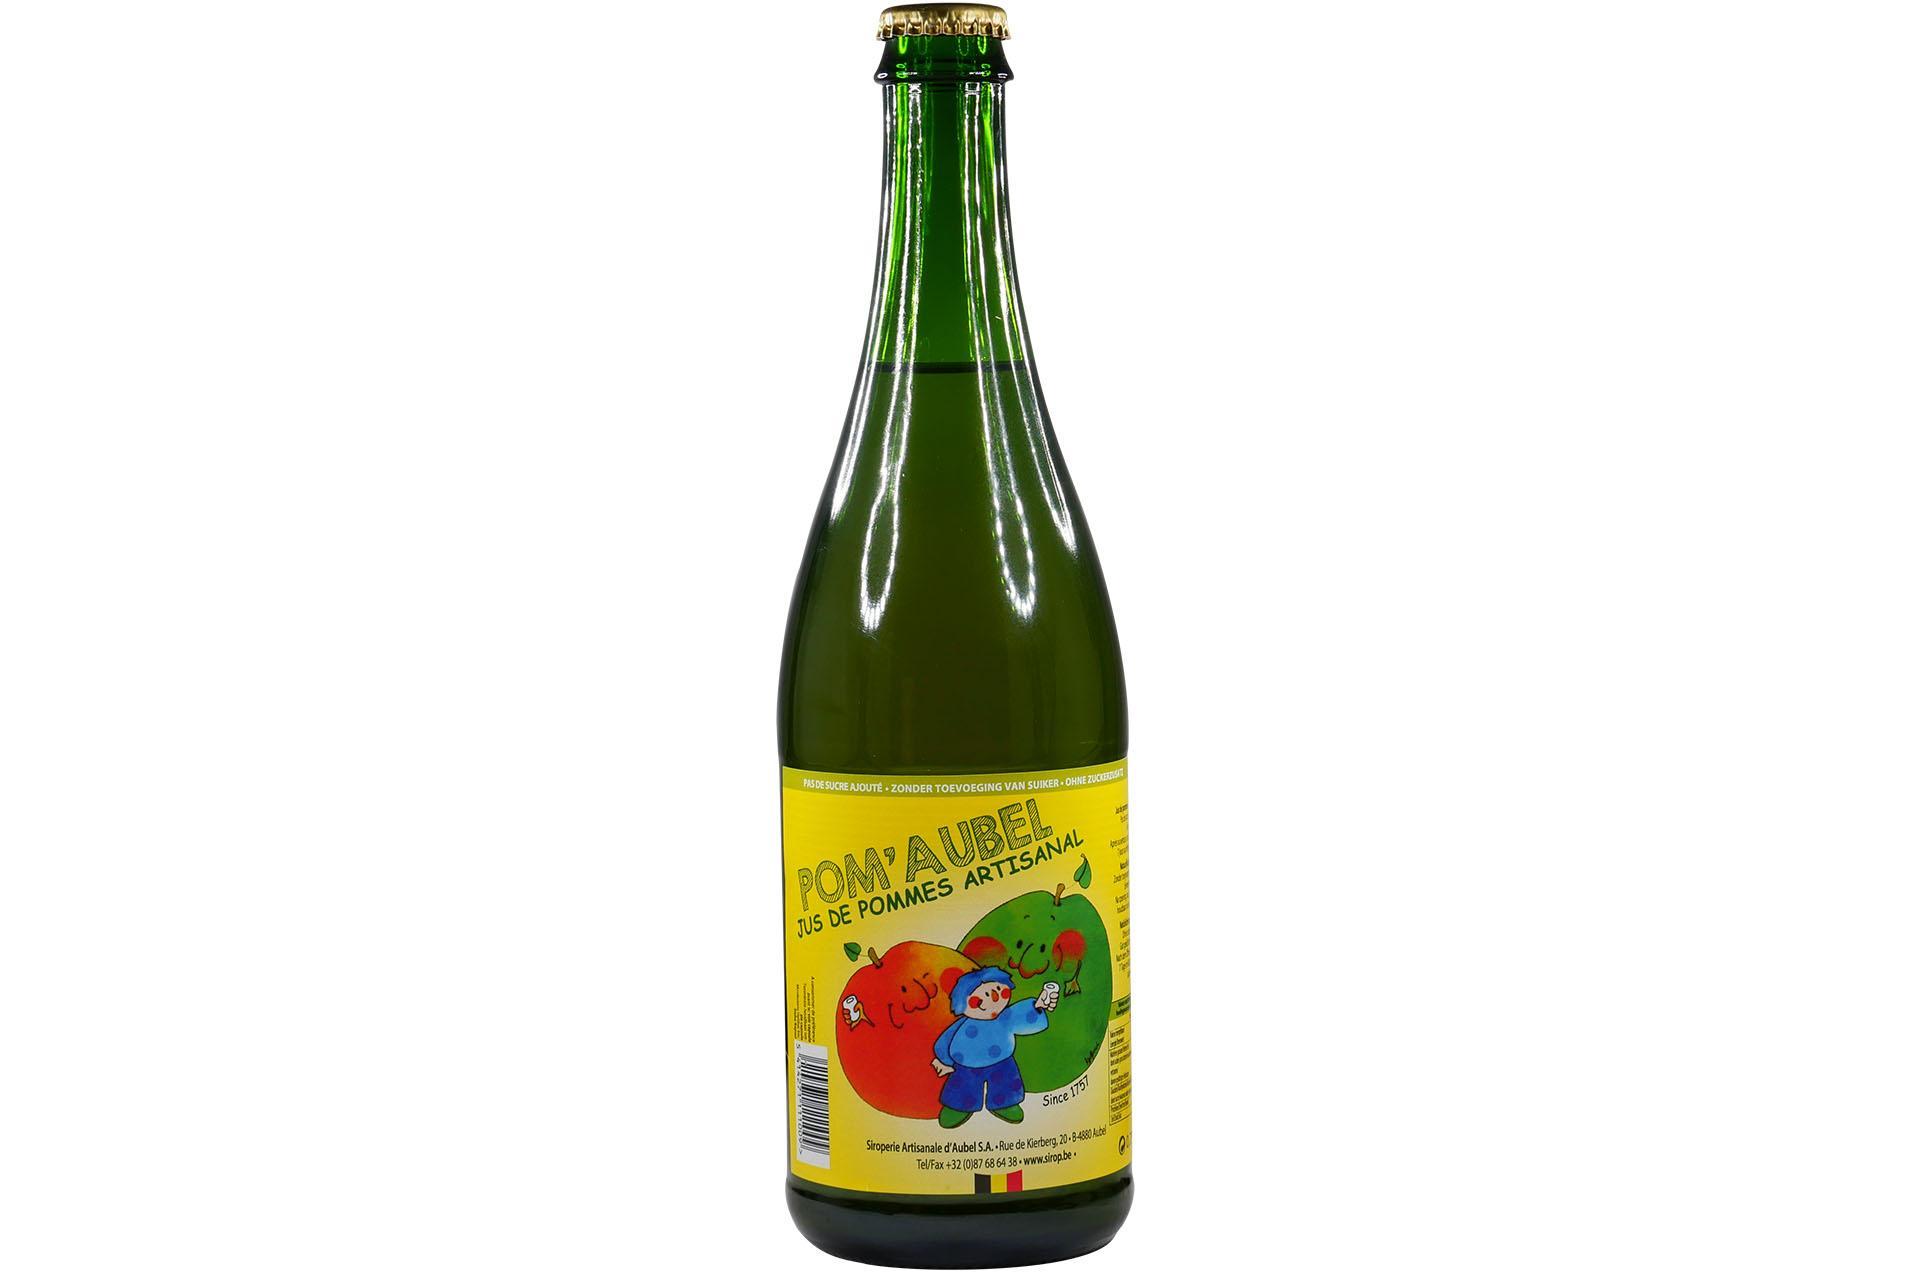 Siroperie Artisanale D'Aubel - Jus de pommes artisanal